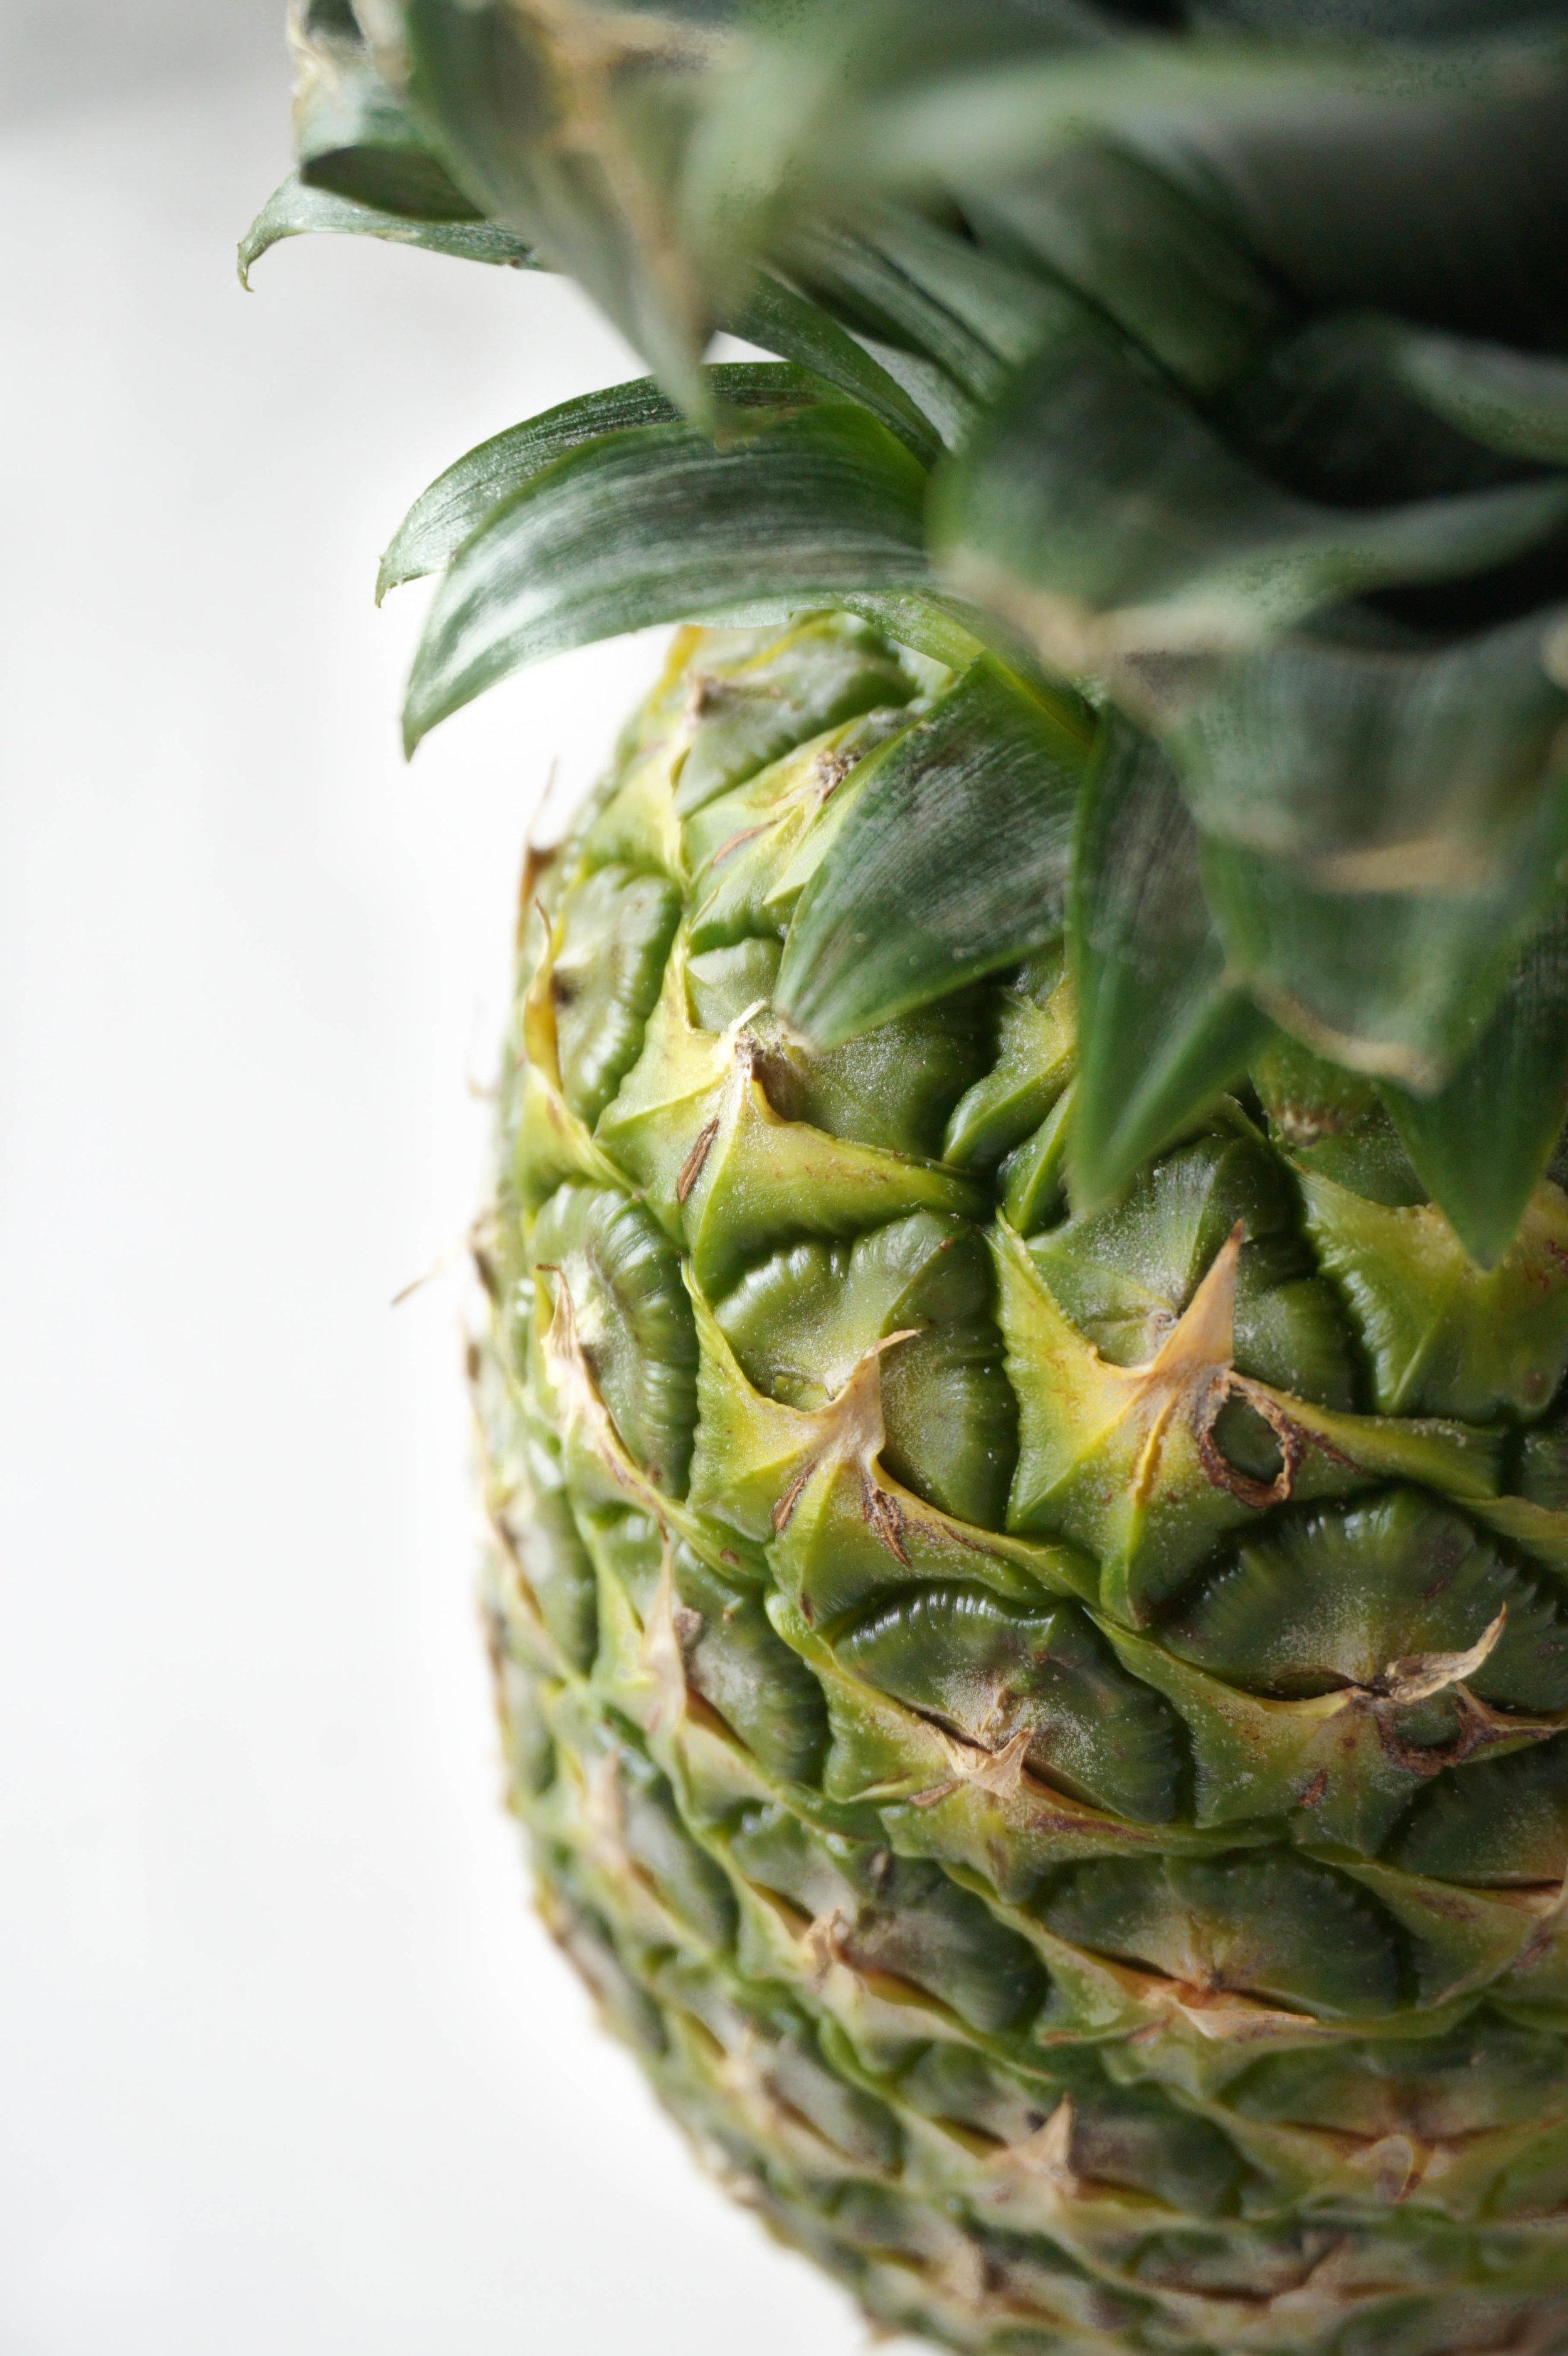 Pineapple Food Photography